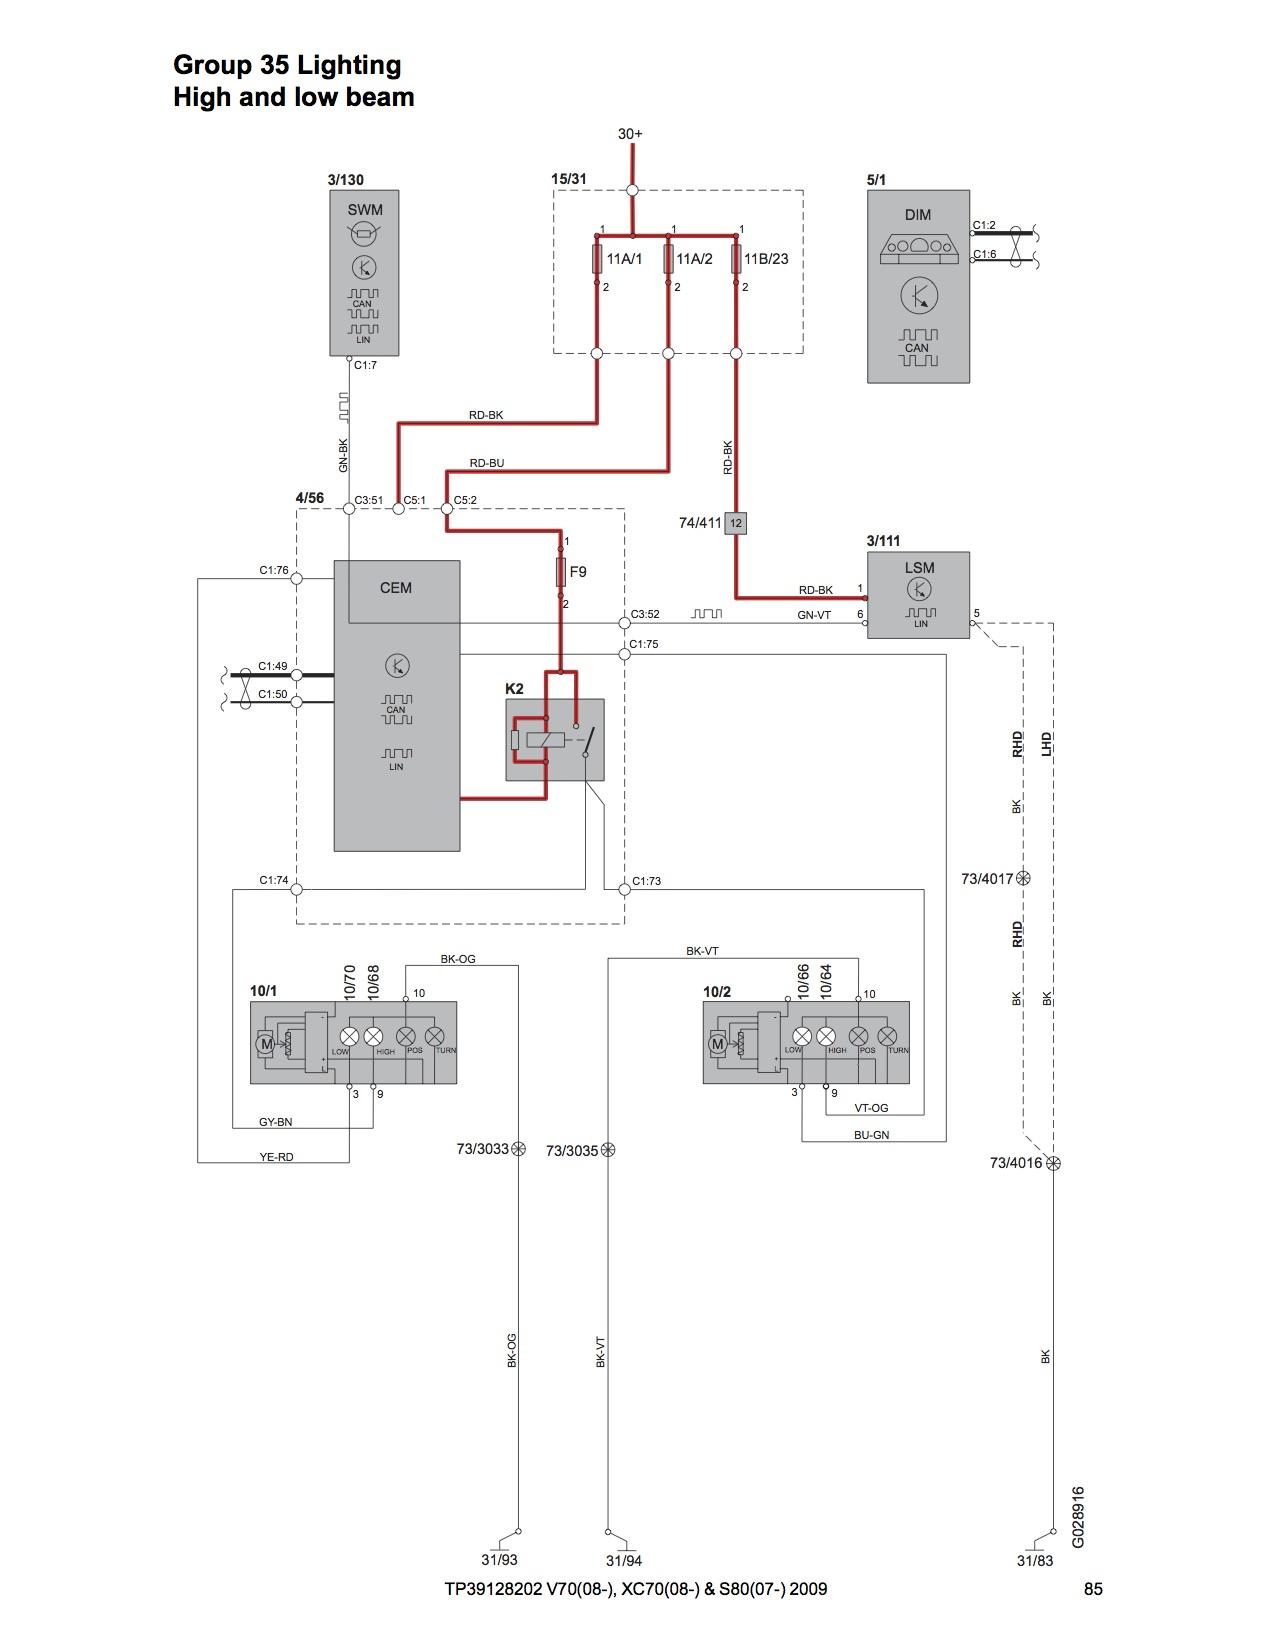 2007 Volvo S60 Wiring Diagram - 1990 Chevy Camaro Ignition Coil Wiring  Diagram - mazda3-sp23.ati-loro.jeanjaures37.fr | 2007 Volvo S60 Wiring Diagram |  | Wiring Diagram Resource